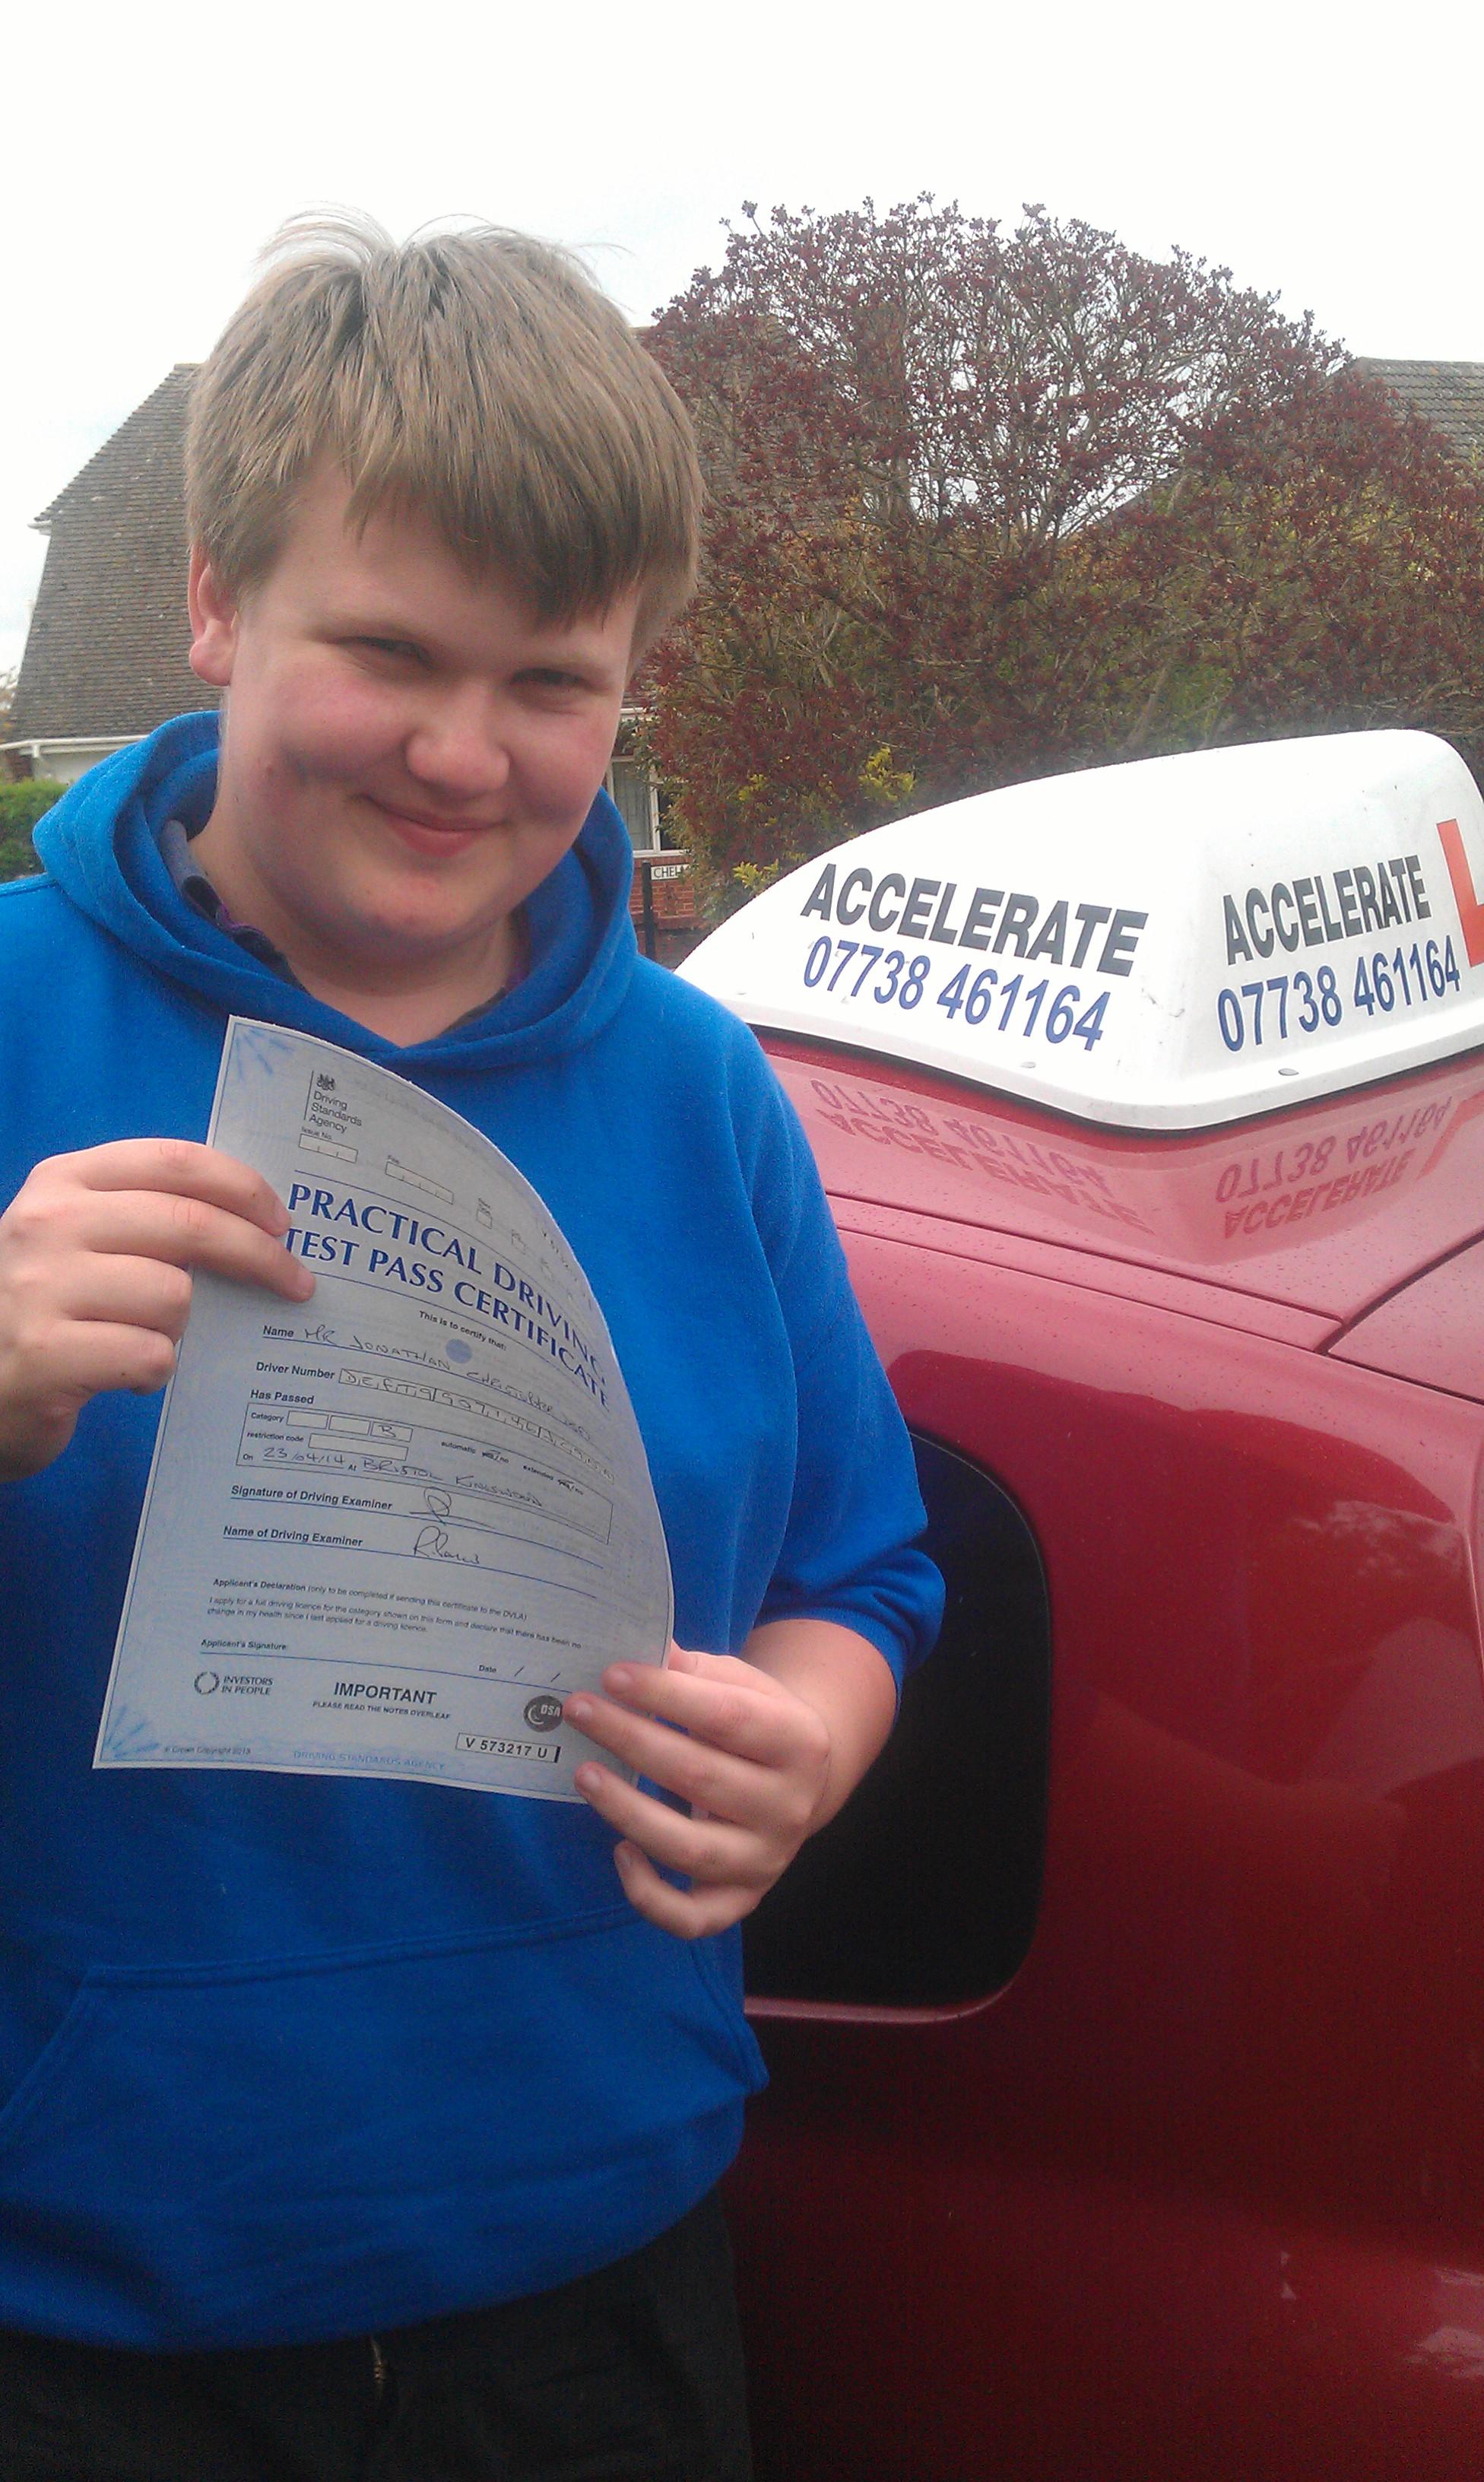 driving schools bristol accelerate driving school